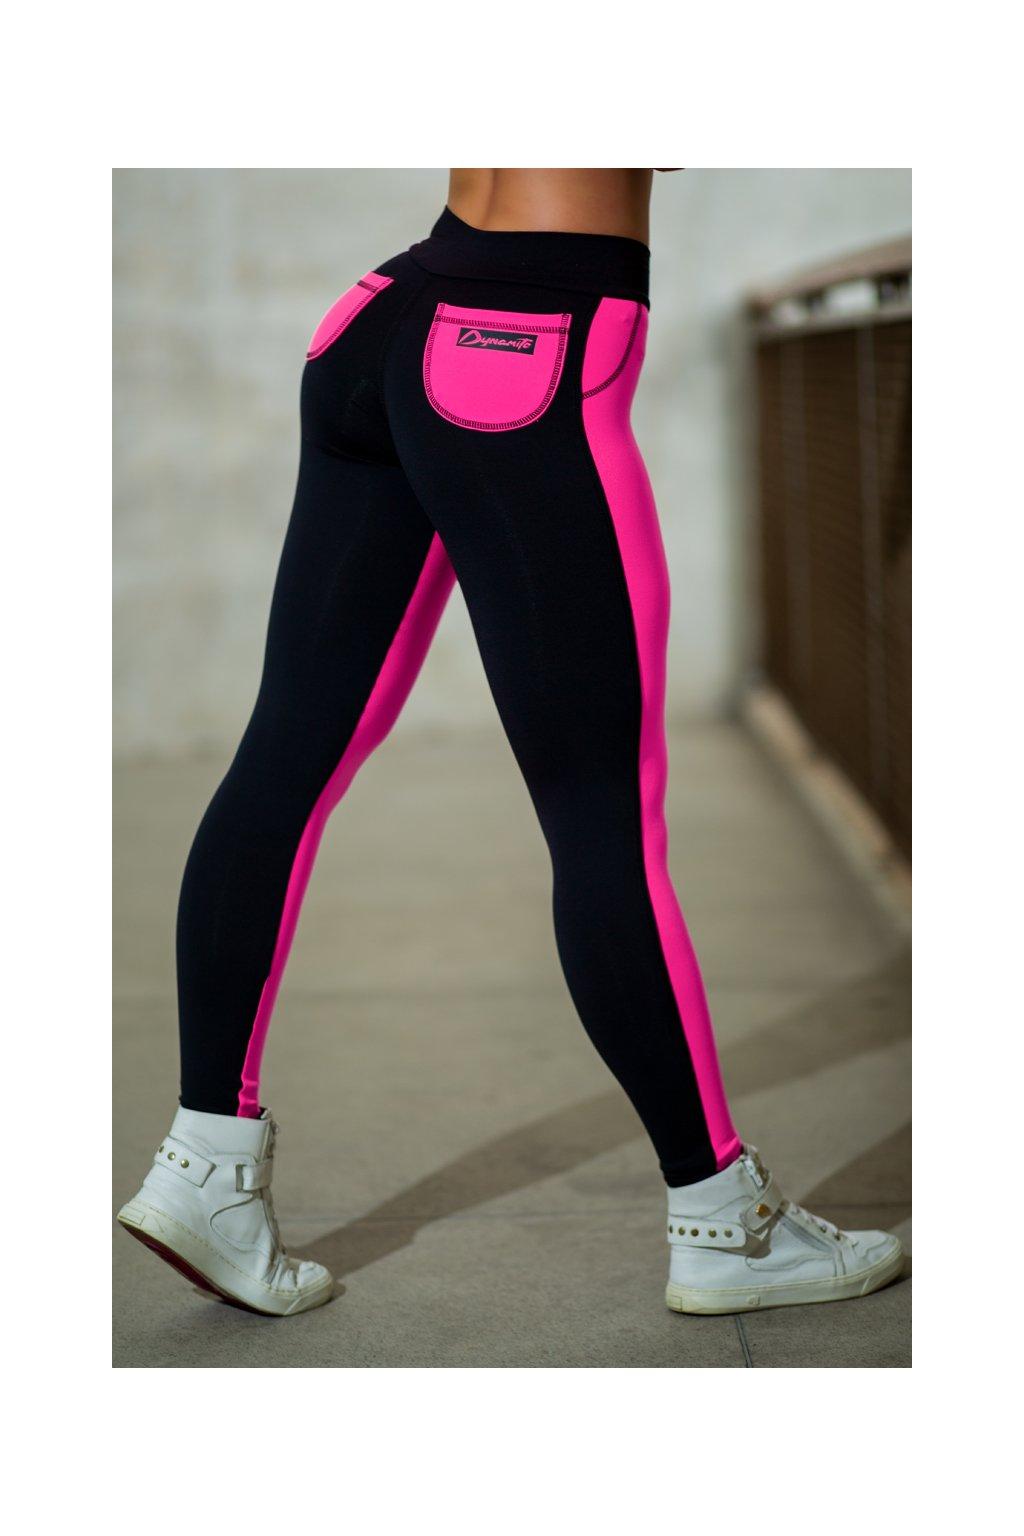 calca legging bolso redondo pacey dynamite 123661 800x1200